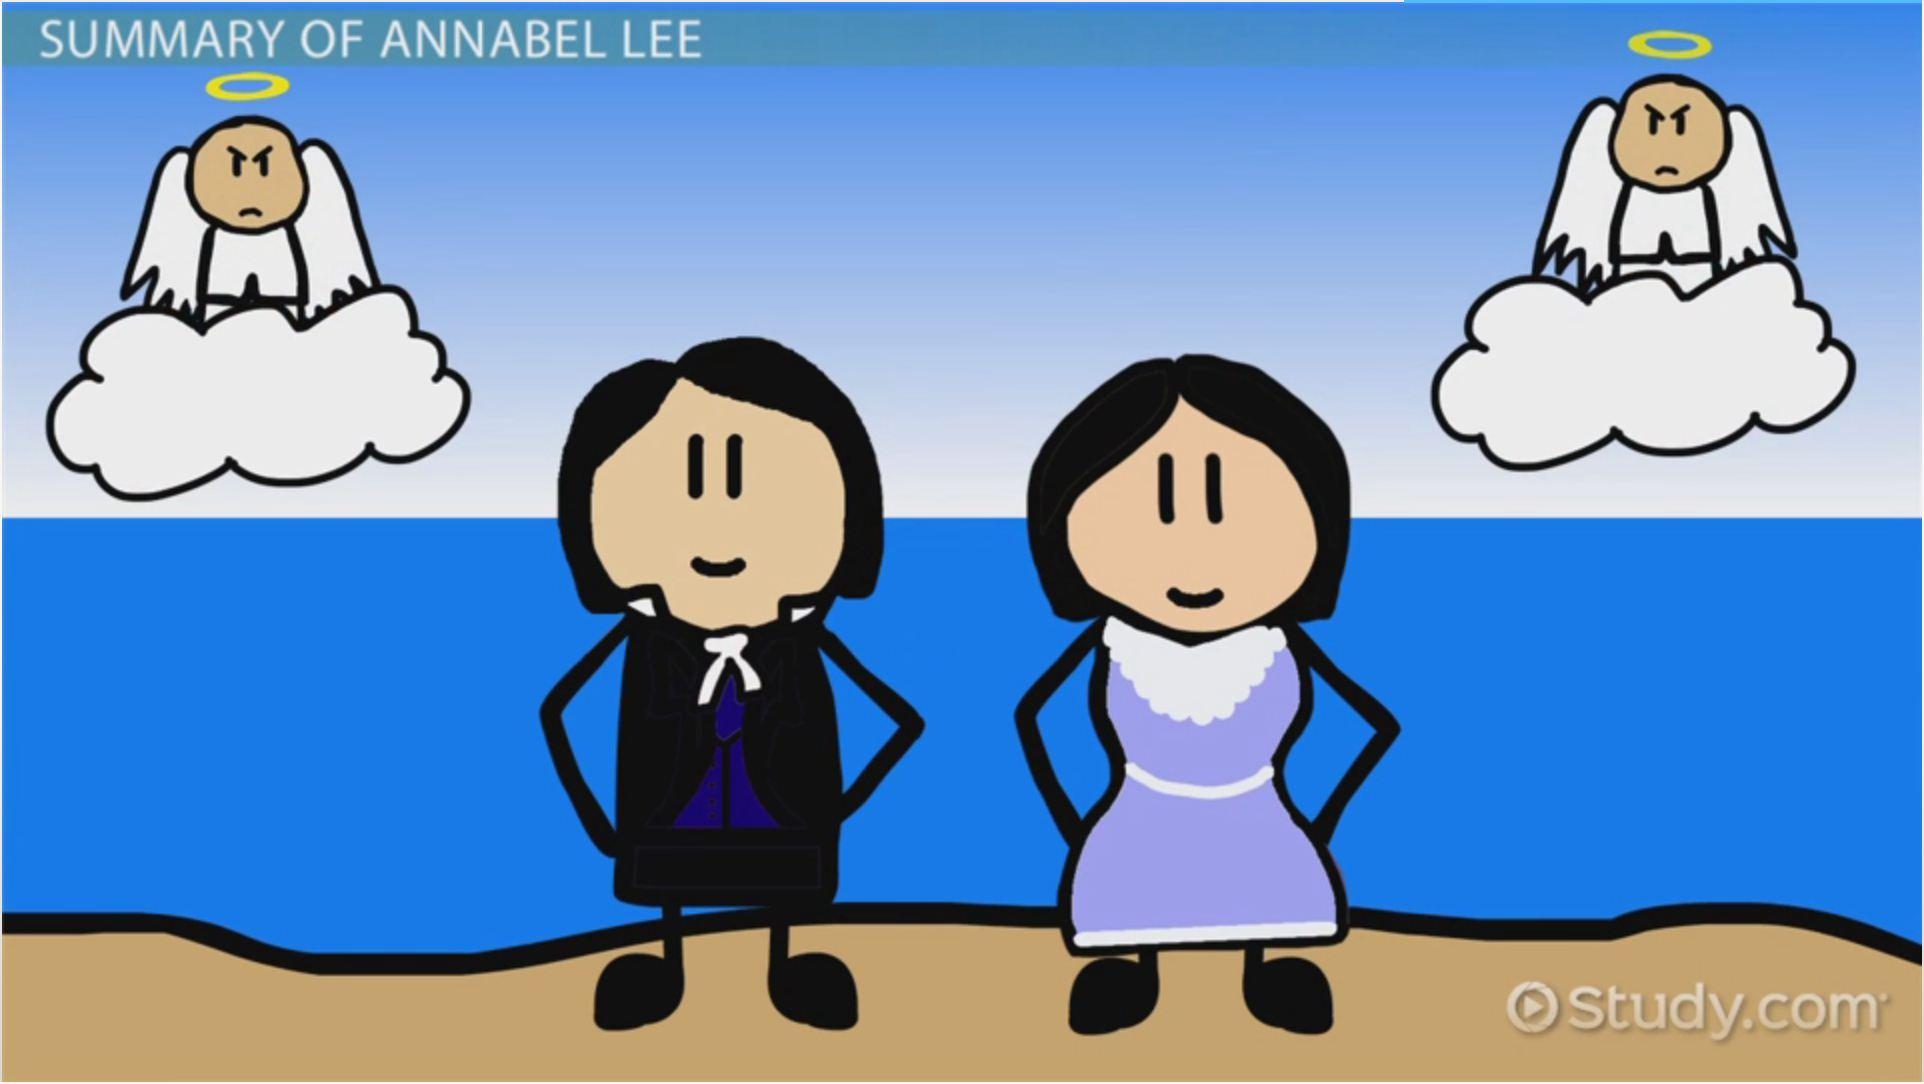 Annabel Lee By Edgar Allan Poe Summary Analysis Theme